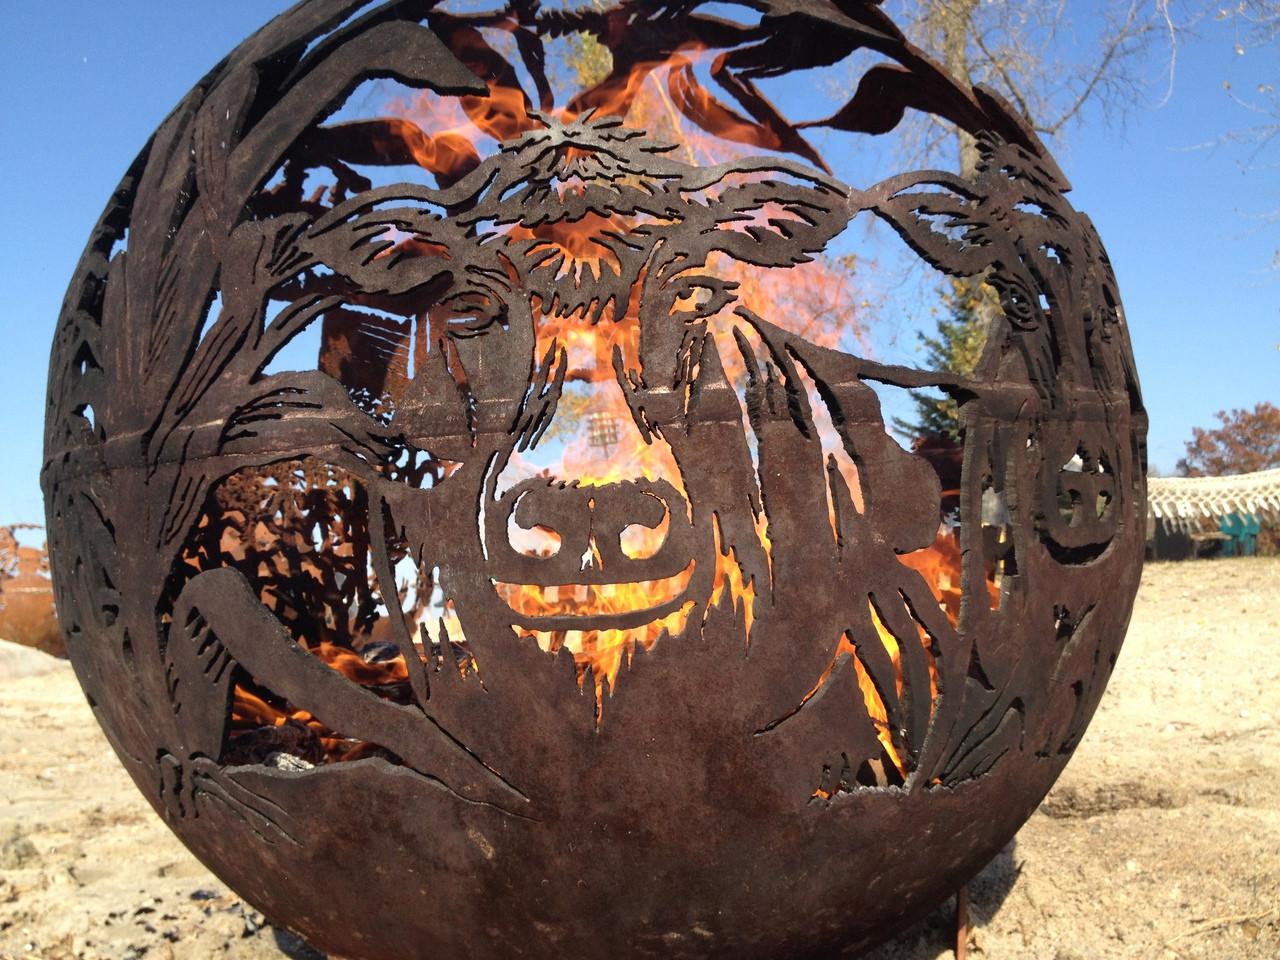 Fireball Fire Pits - Farm - 37.5 inch Fire Globe - Fireball Fire Pits - Farm - 37.5 Inch Fire Globe - 3715FA - The Fire